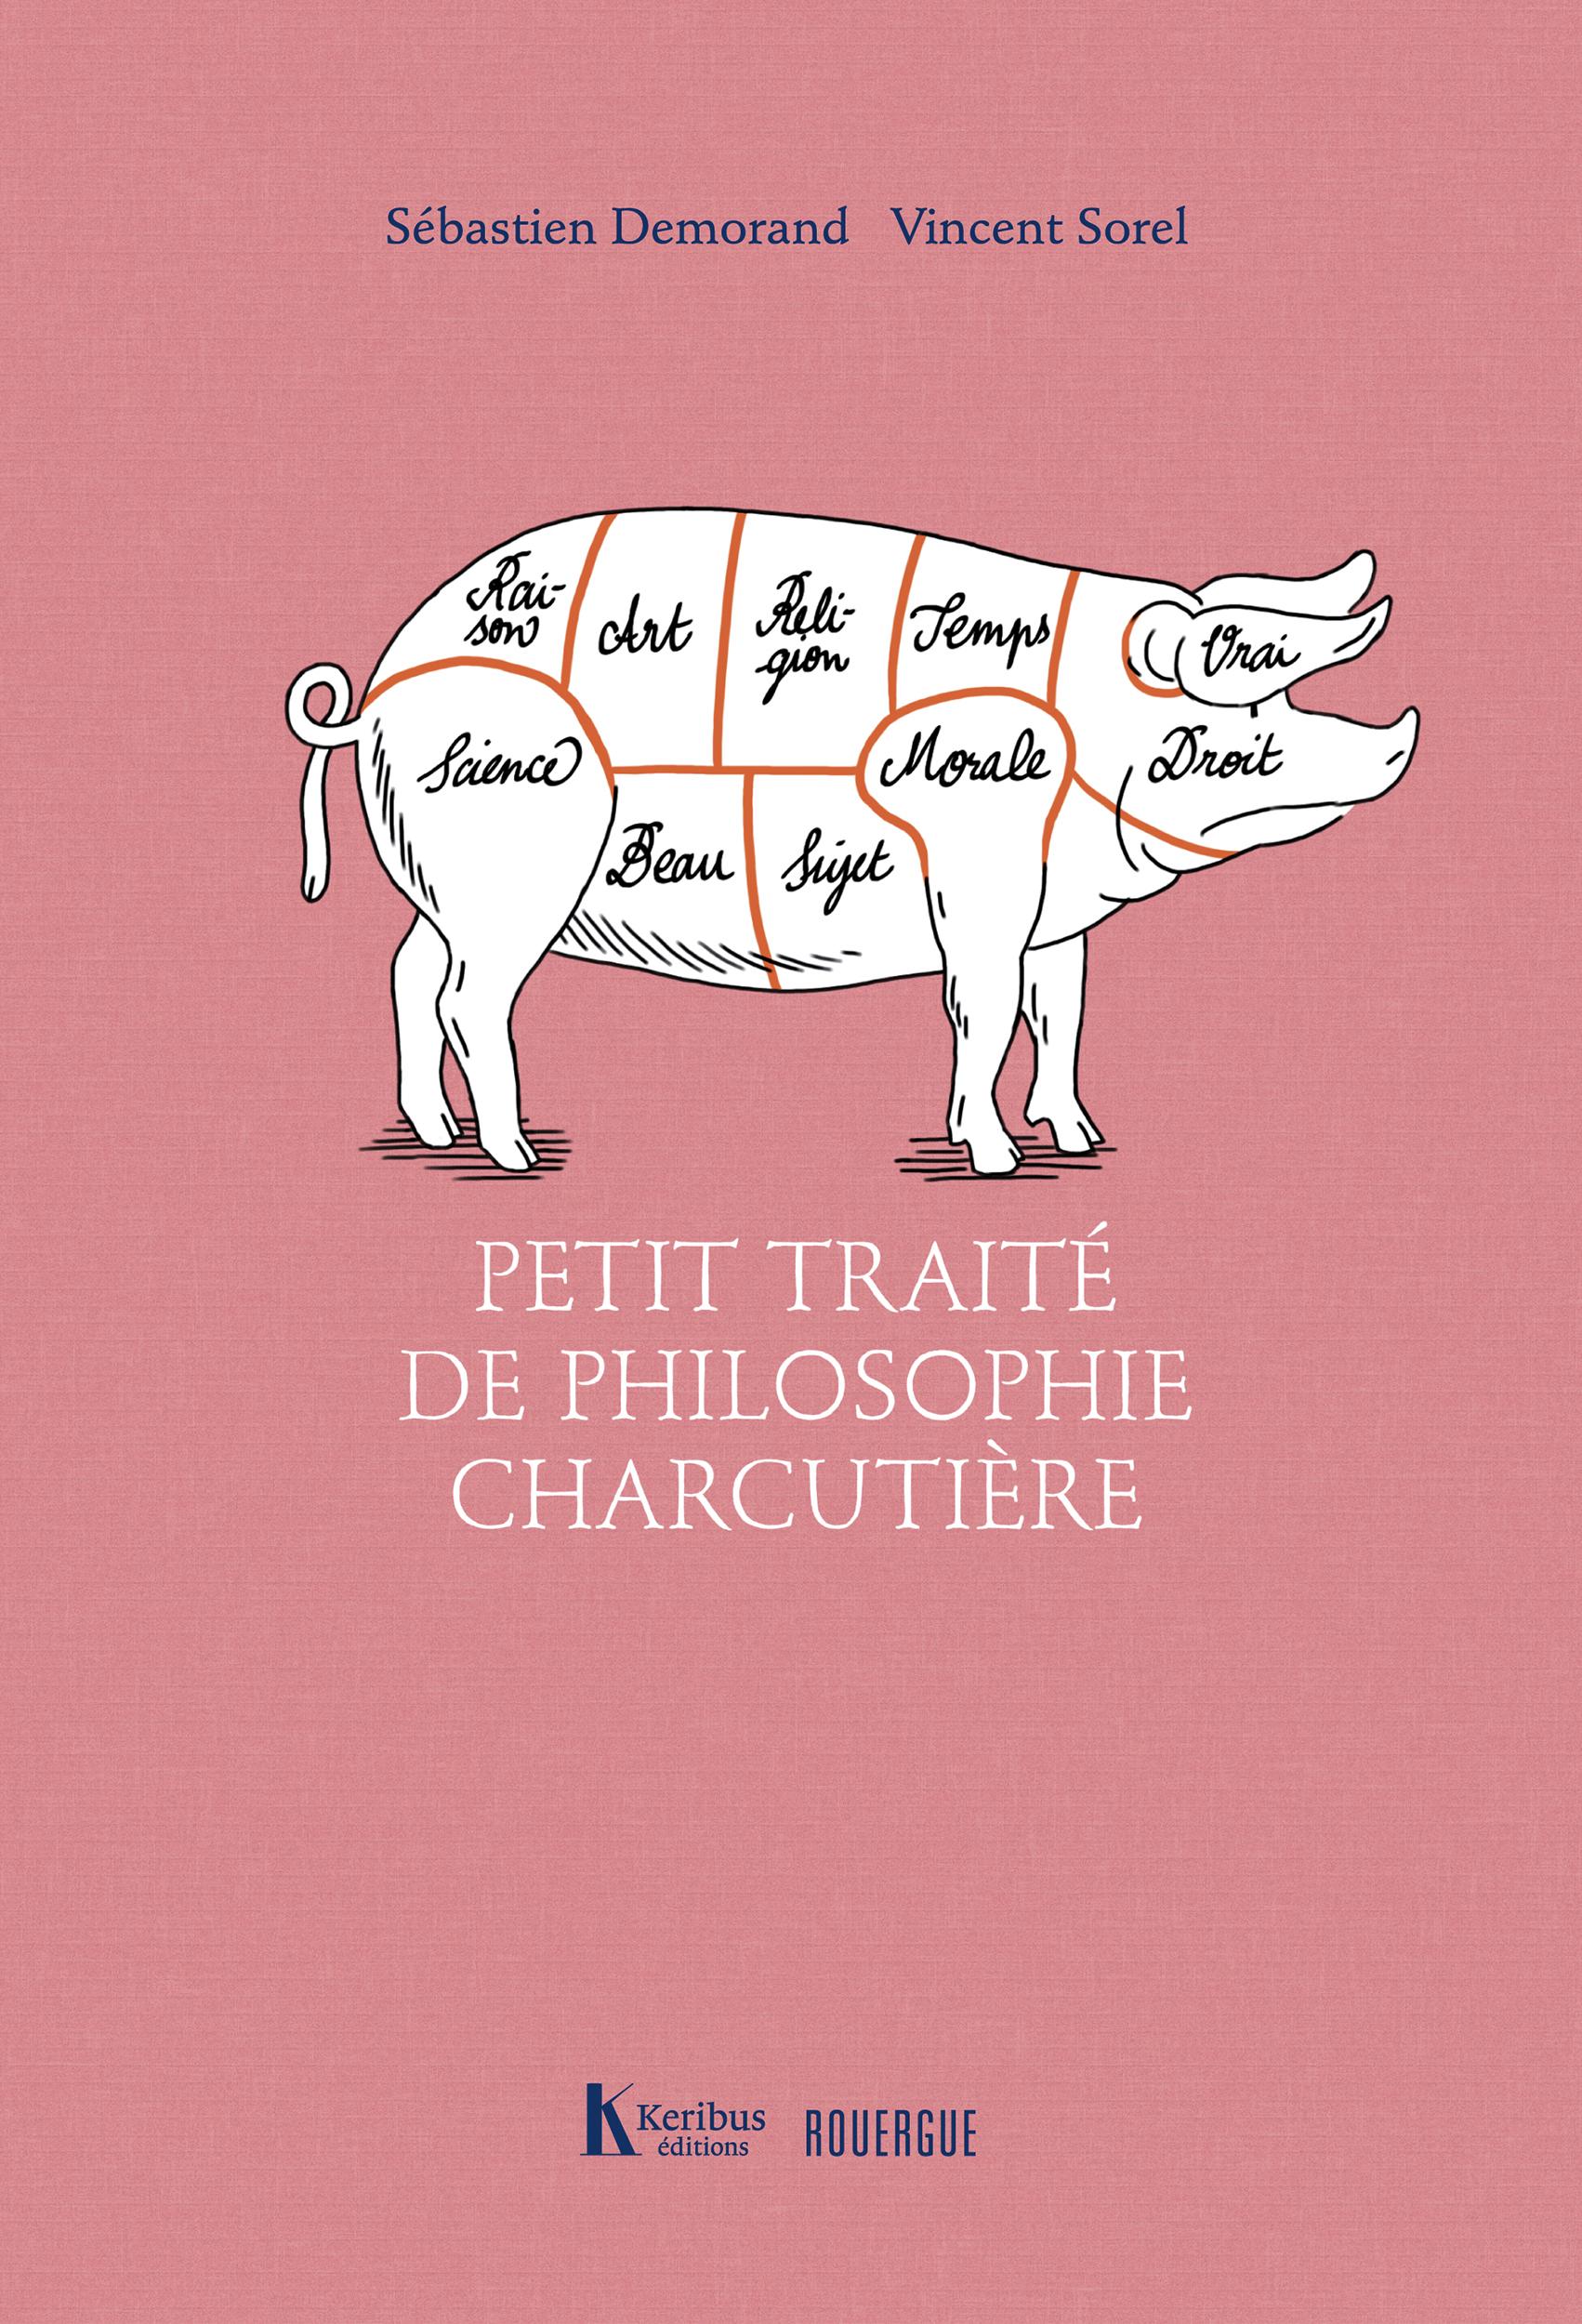 Petit traite Charcuterie Cover keribus editions